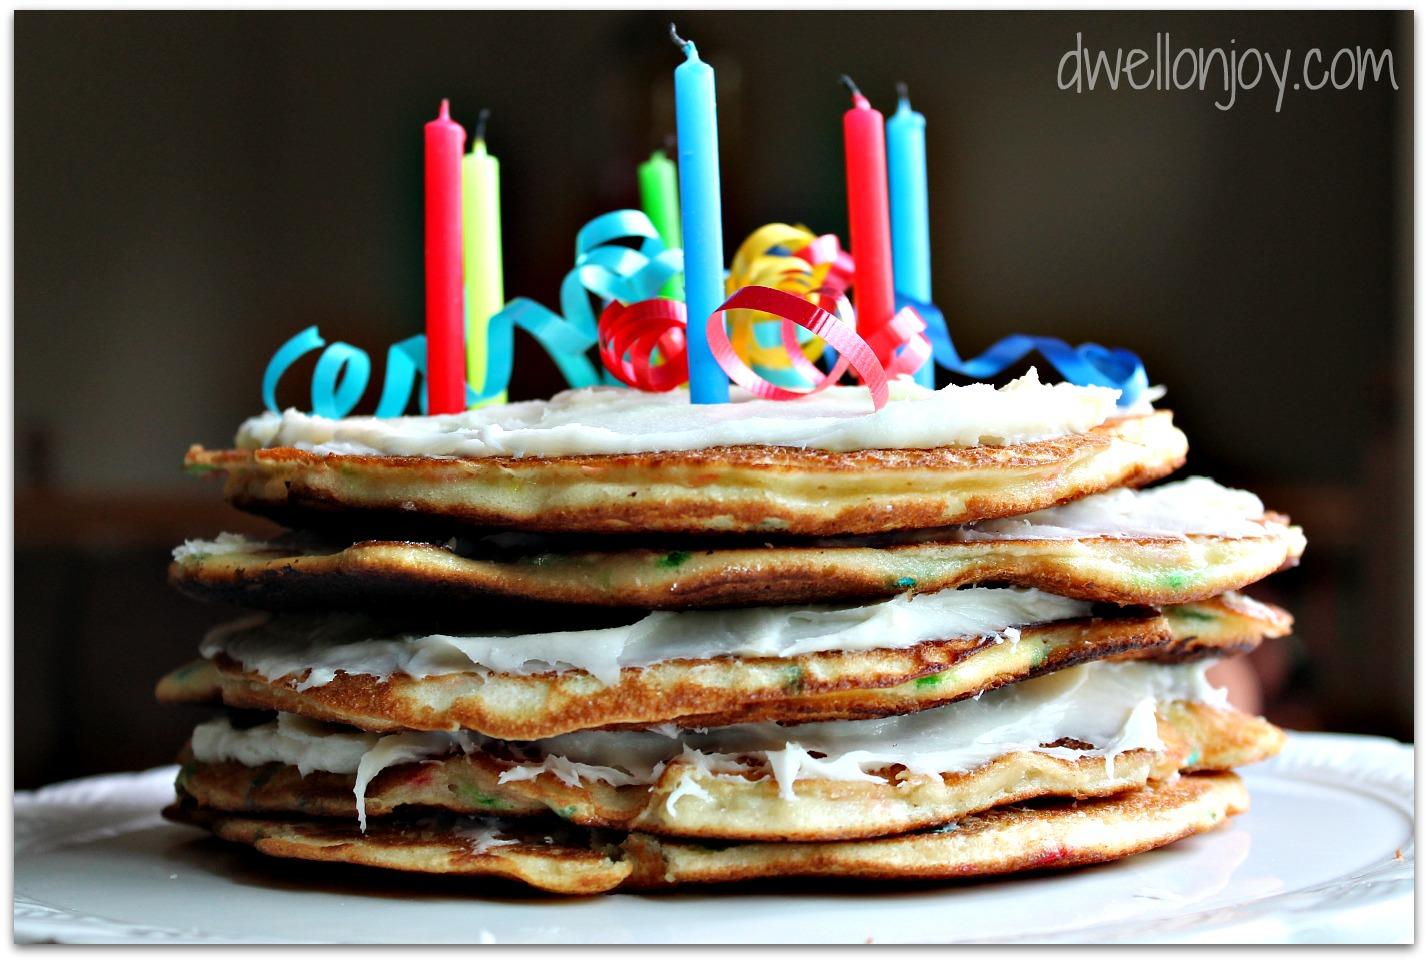 Unconventional Birthday Cakes